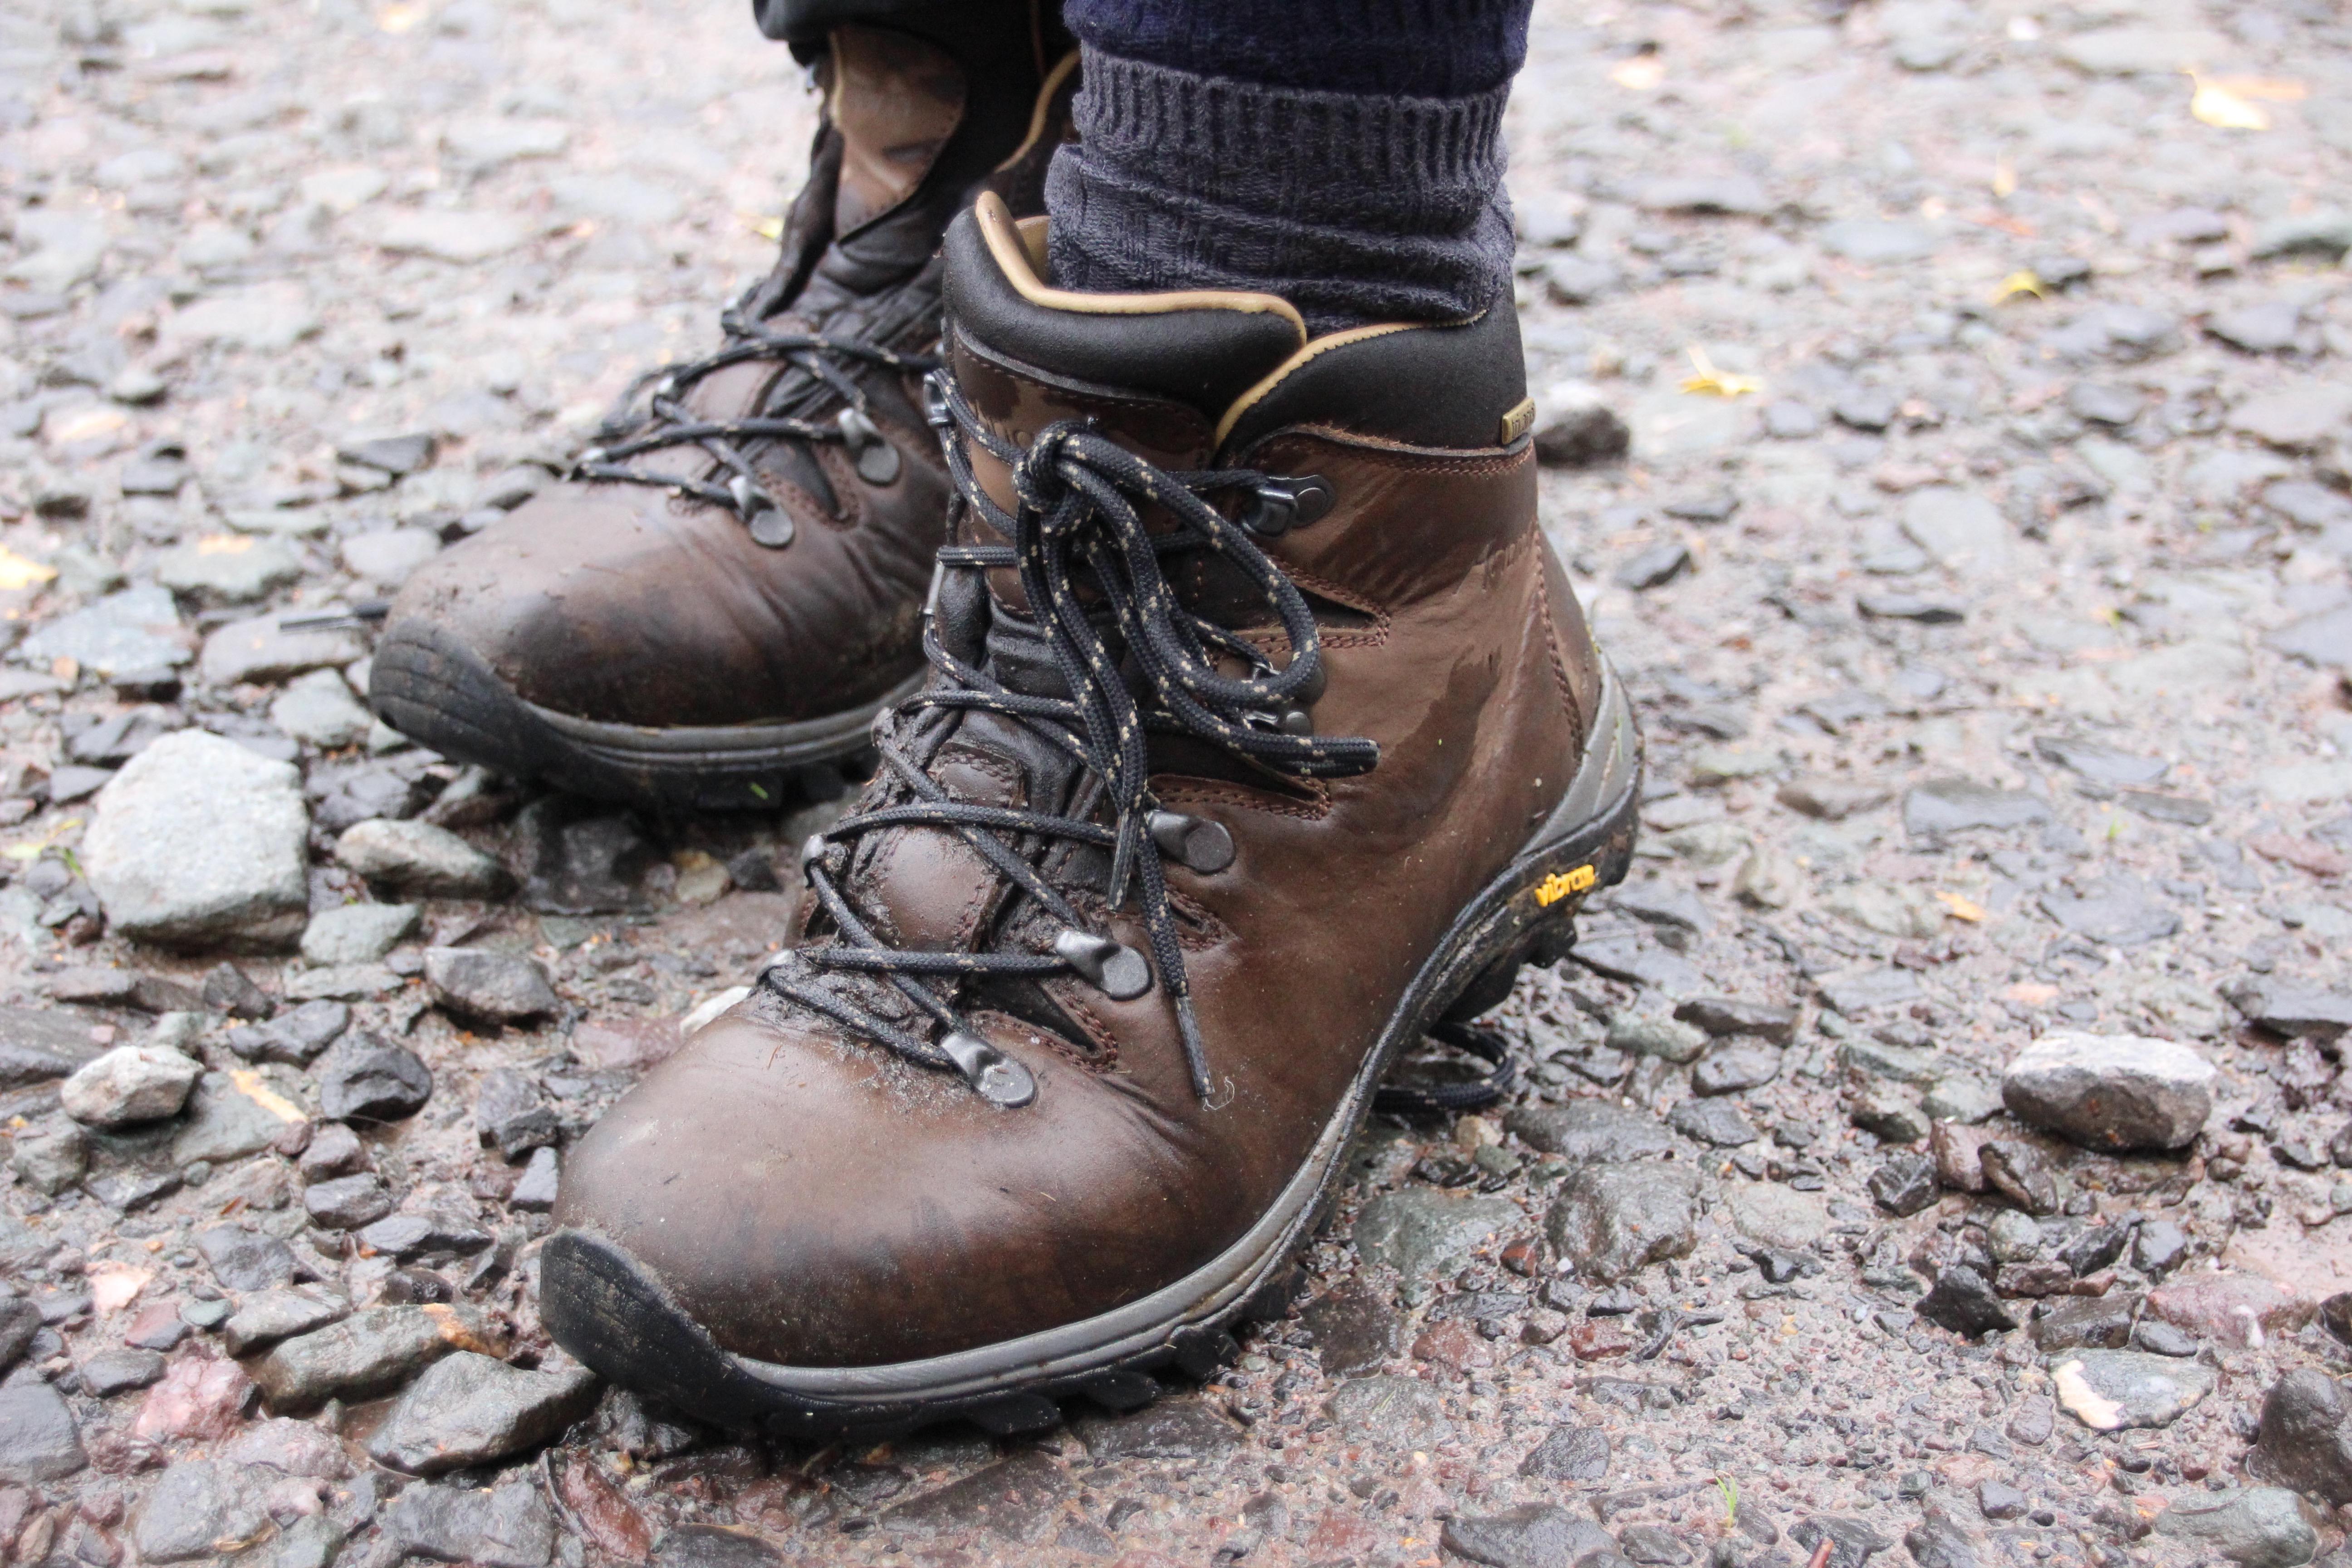 anatom q2 classic hiking boot